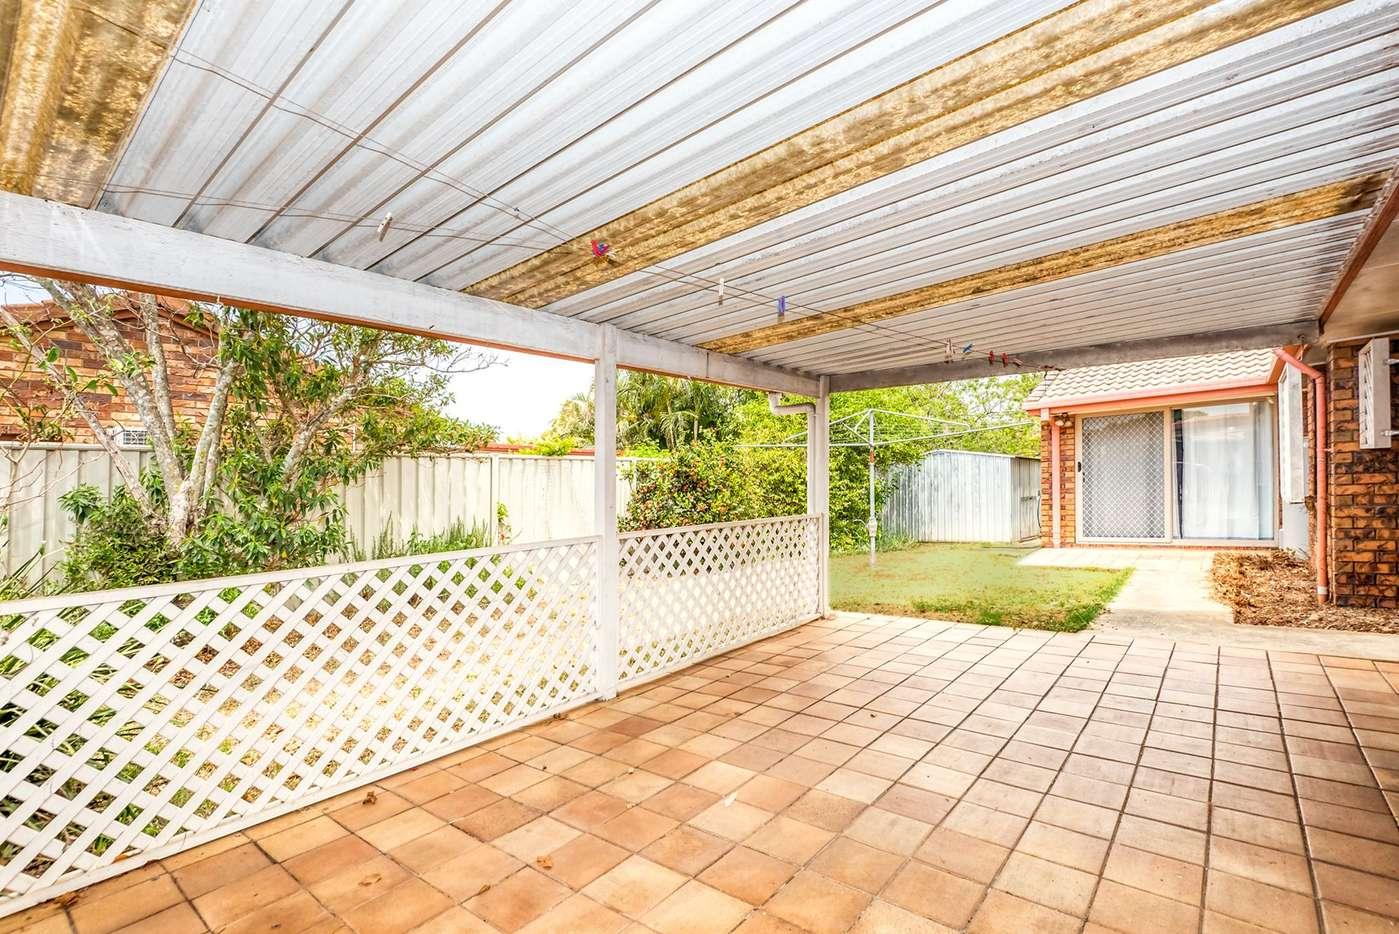 Main view of Homely house listing, 26 Mako Street, Runcorn, QLD 4113